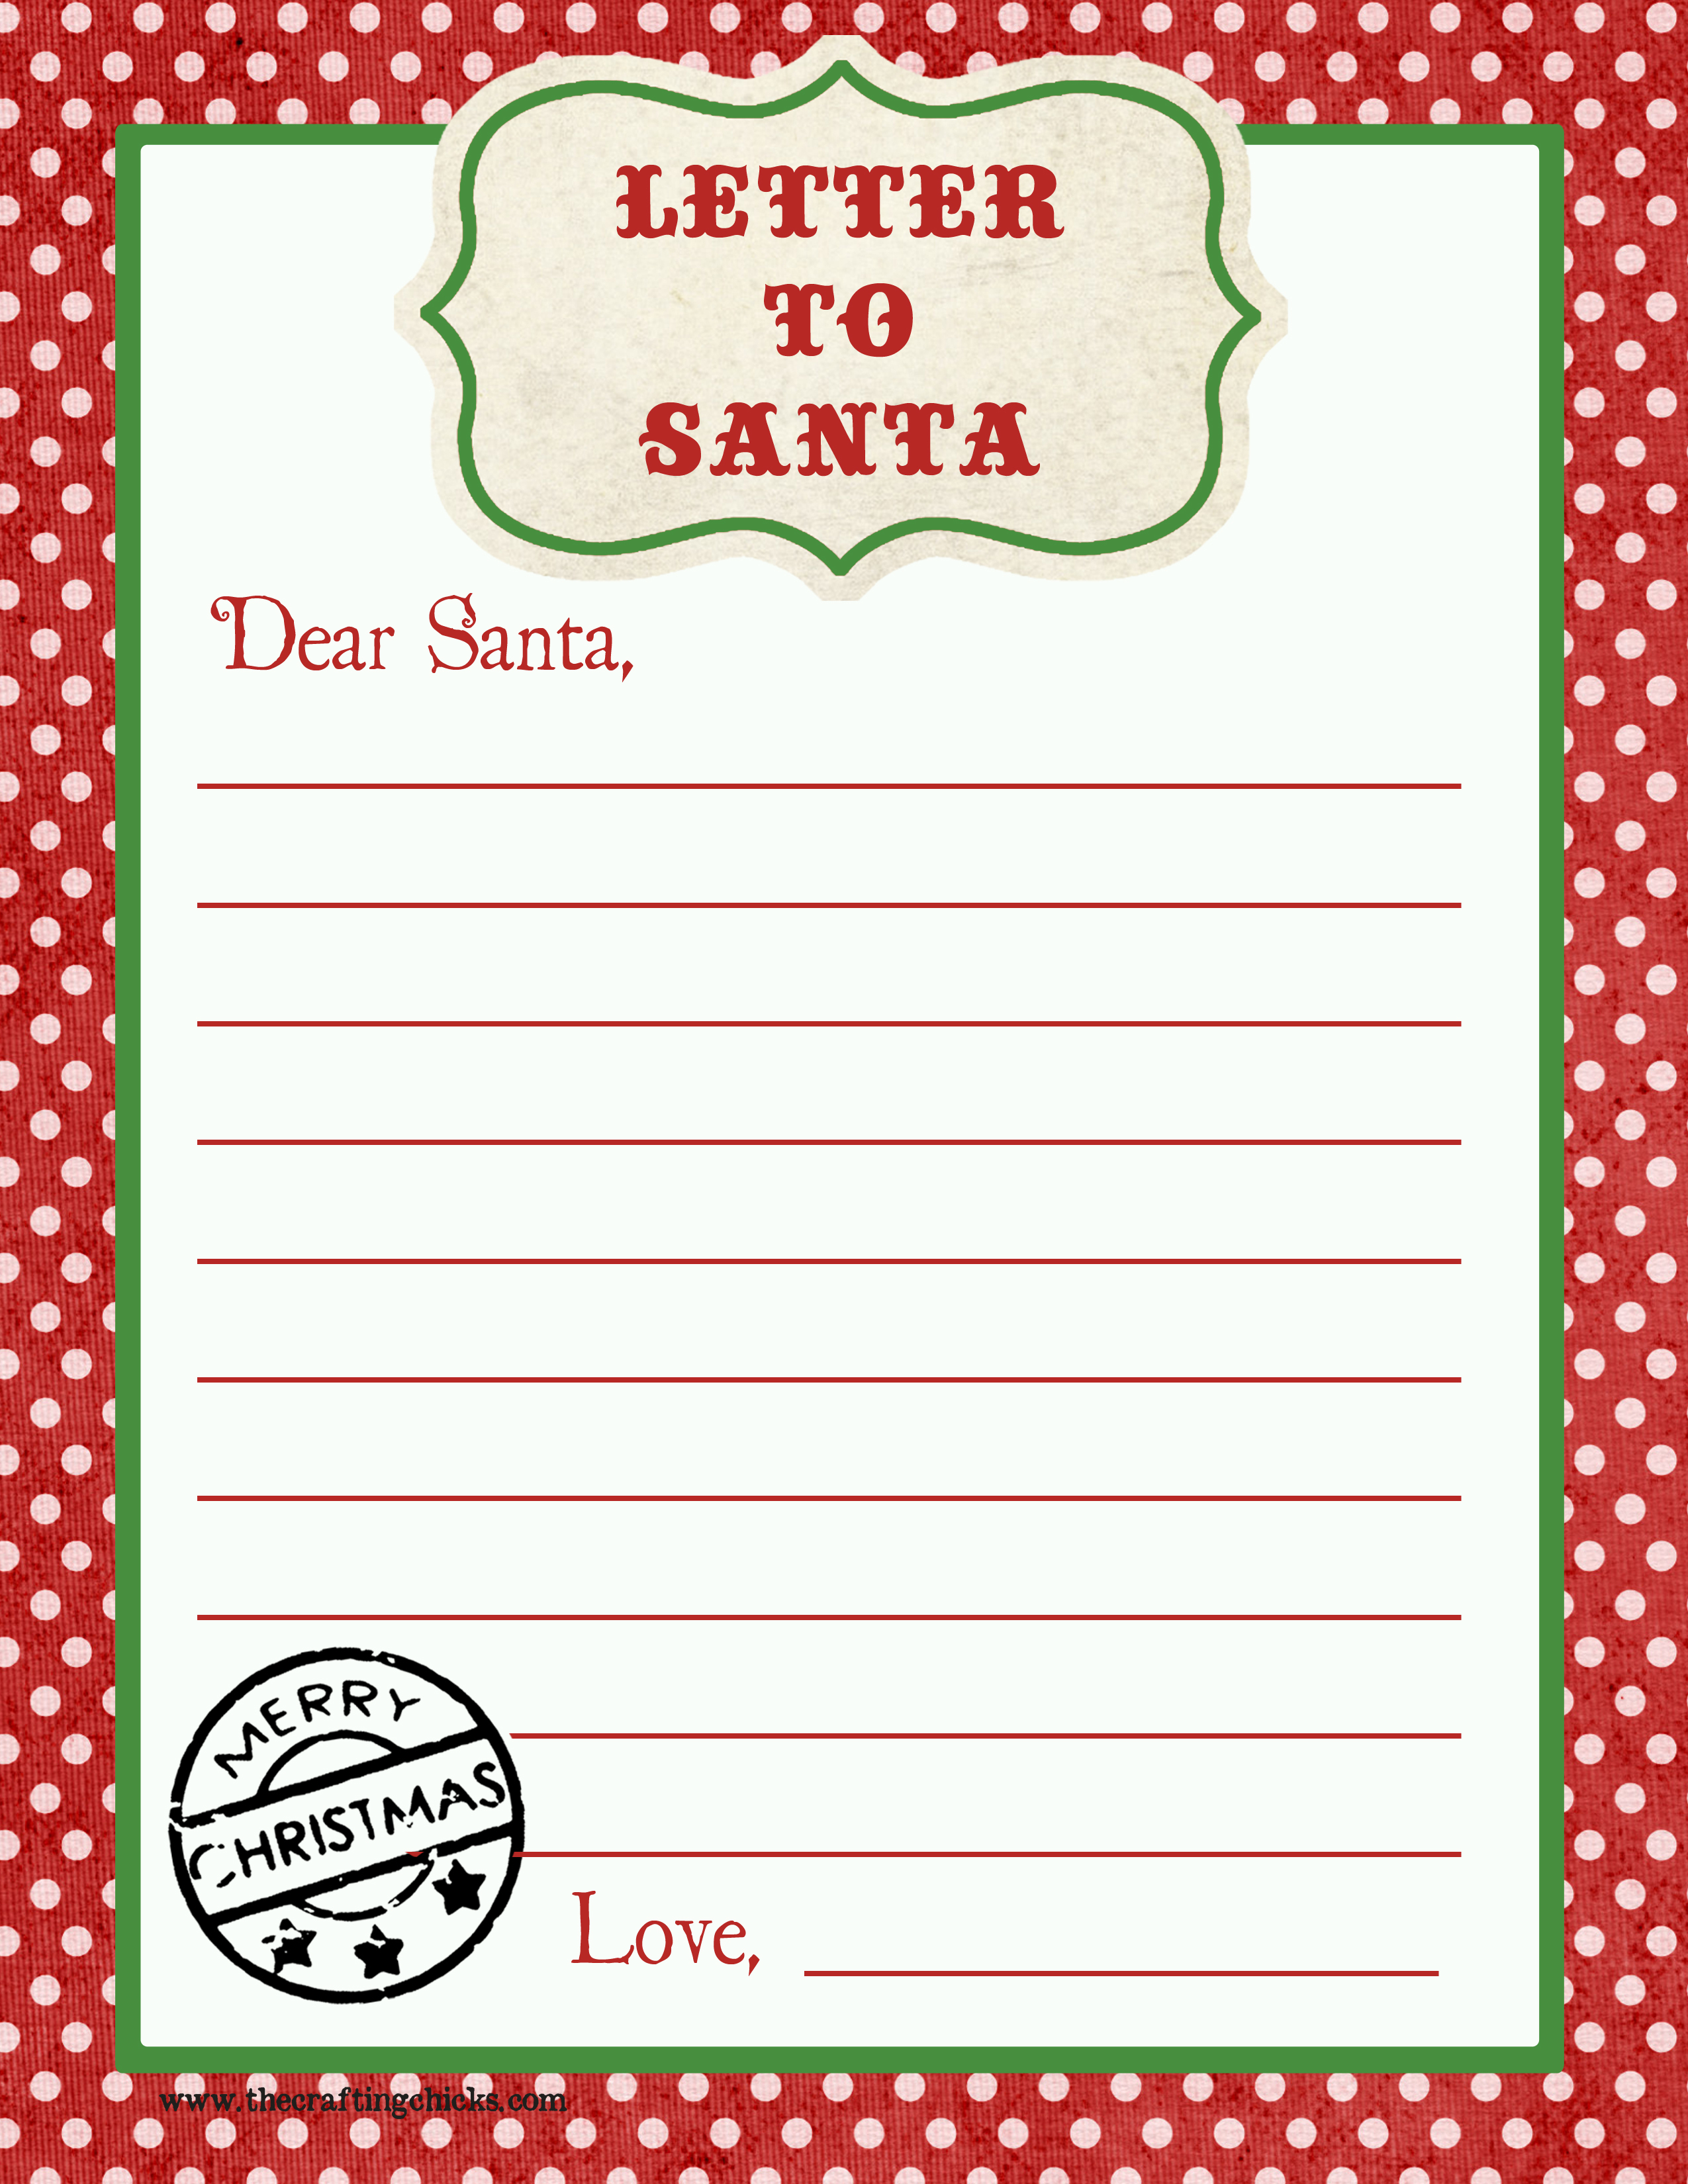 Letter To Santa Free Printable Download - Free Printable Santa Letter Paper